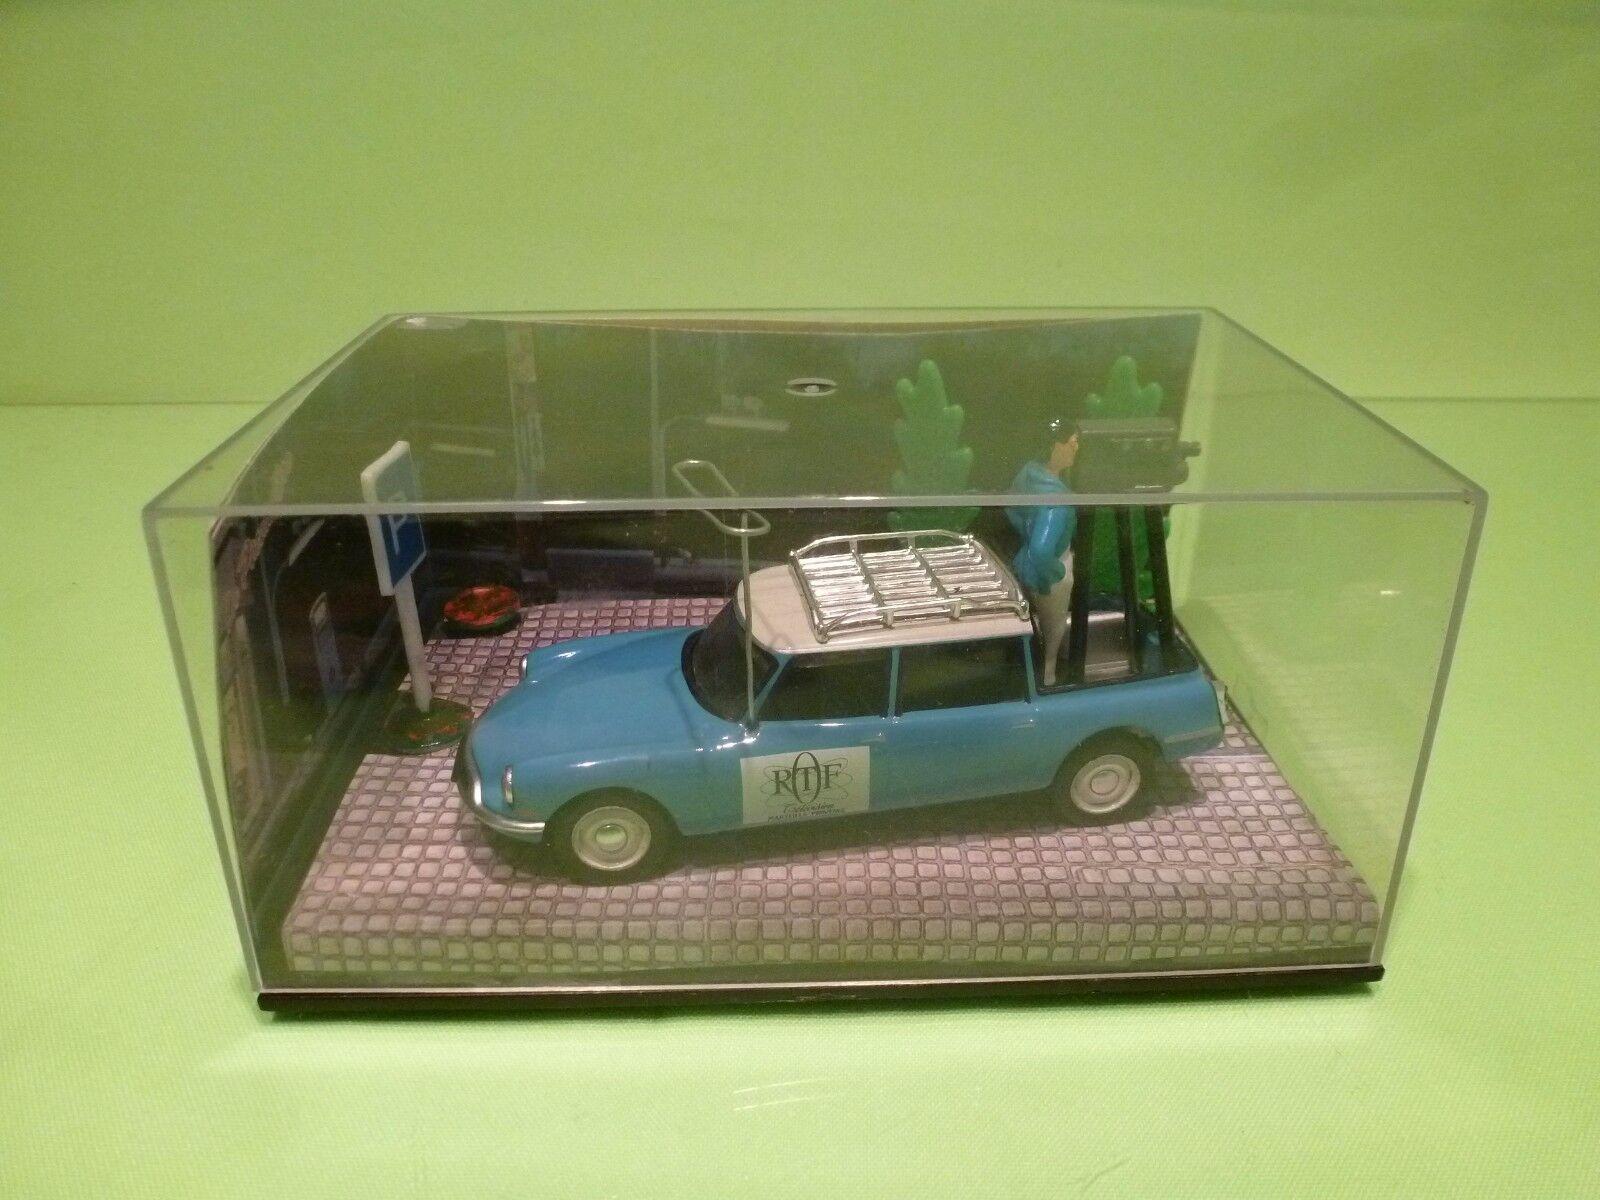 DIORAMA MRF BUILT KIT CITROEN SM RALLYE - blueeE 1 43 - GOOD IN BOX